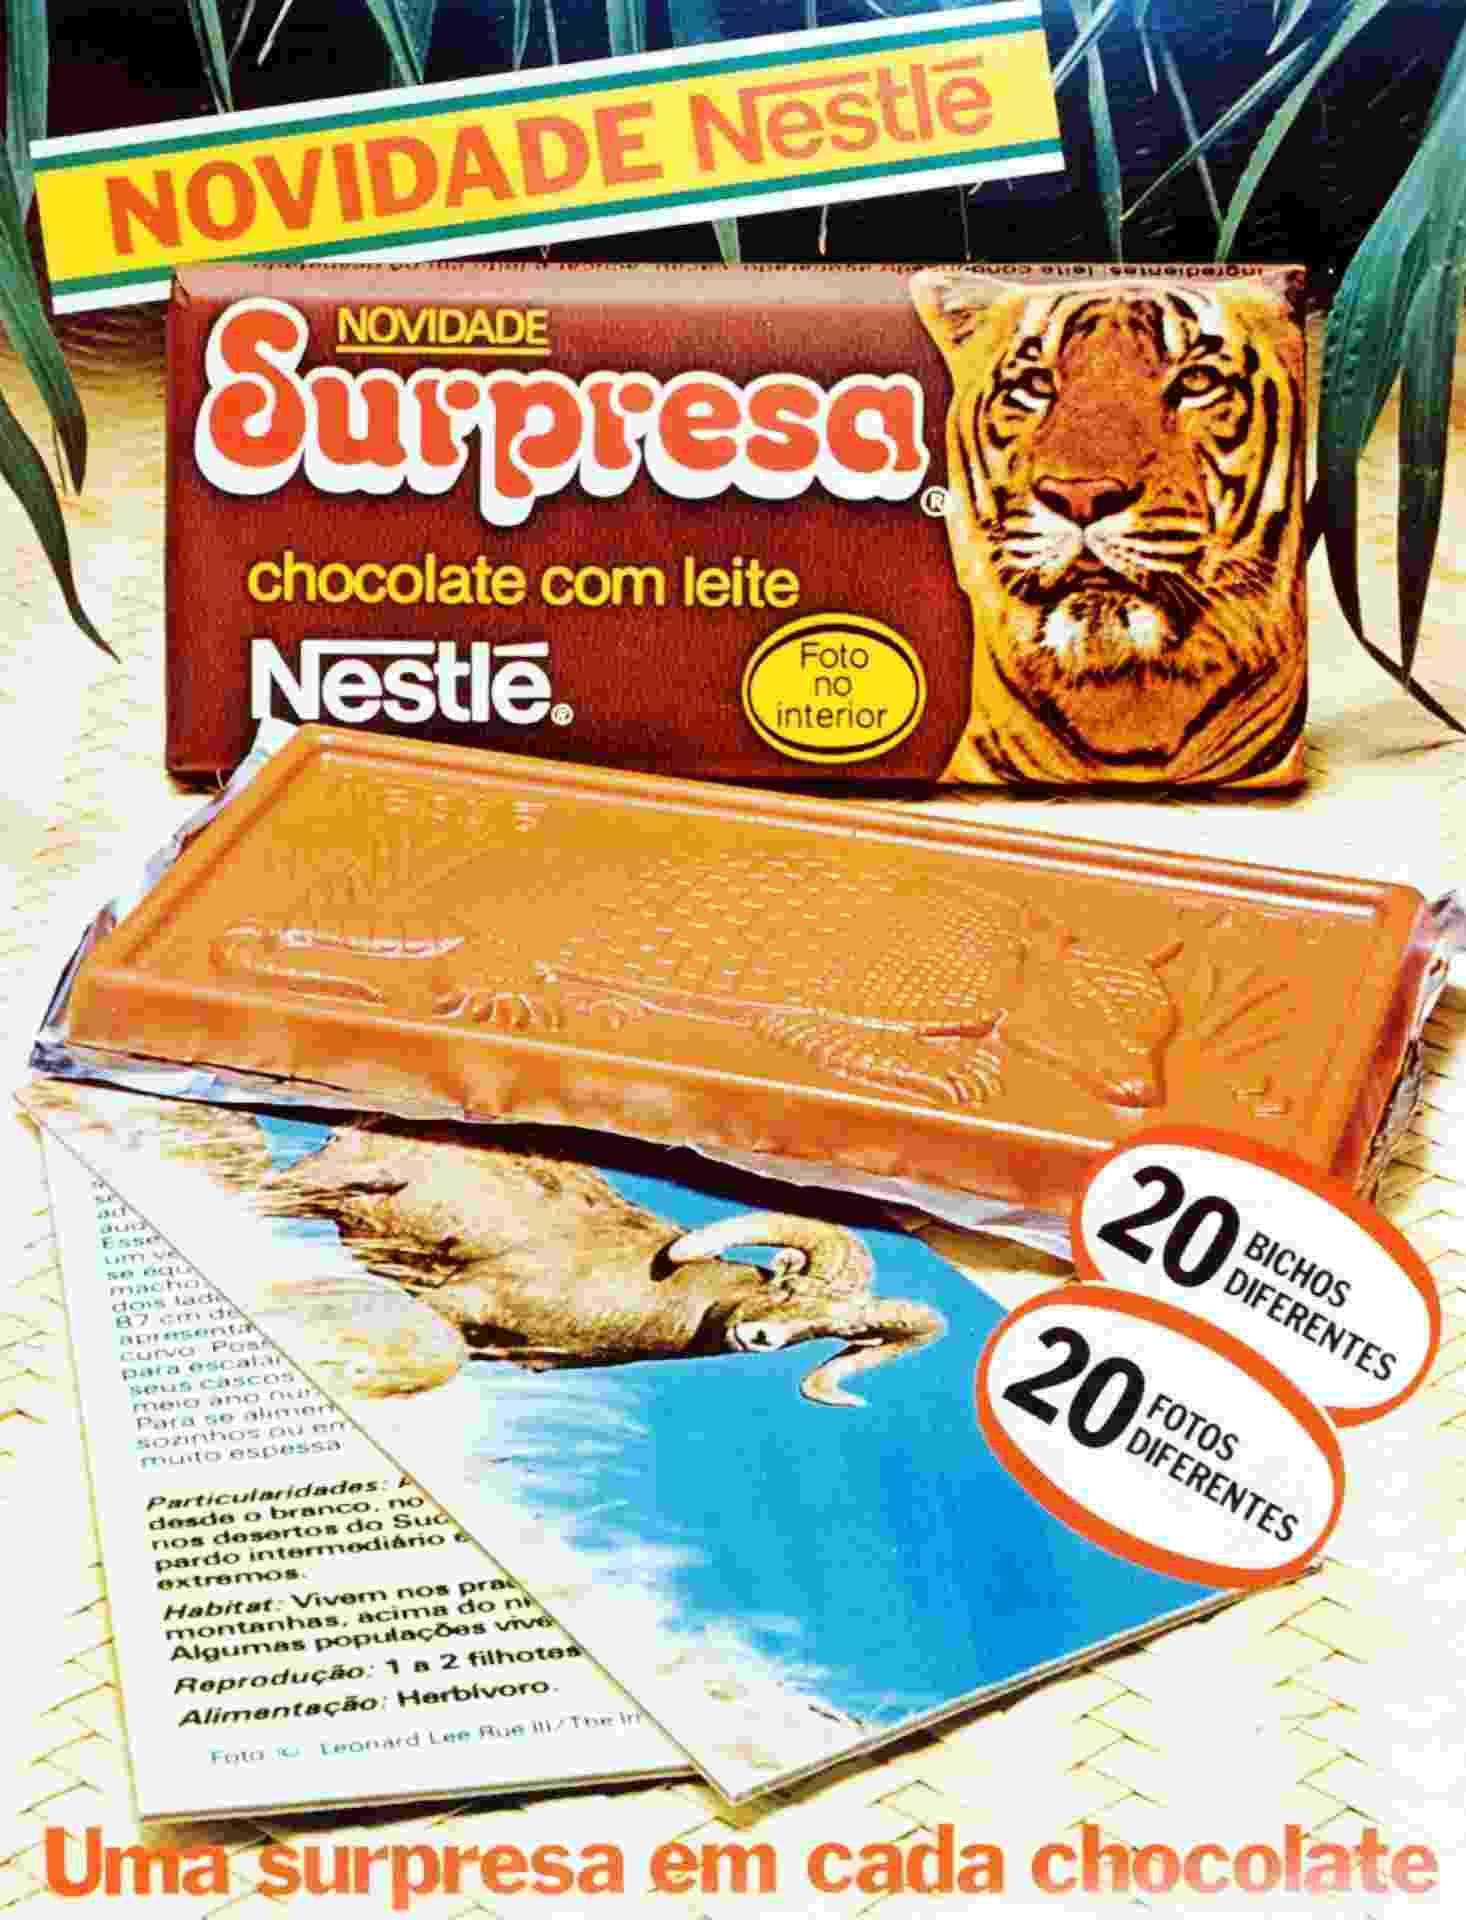 Chocolate Surpresa - Divulgação